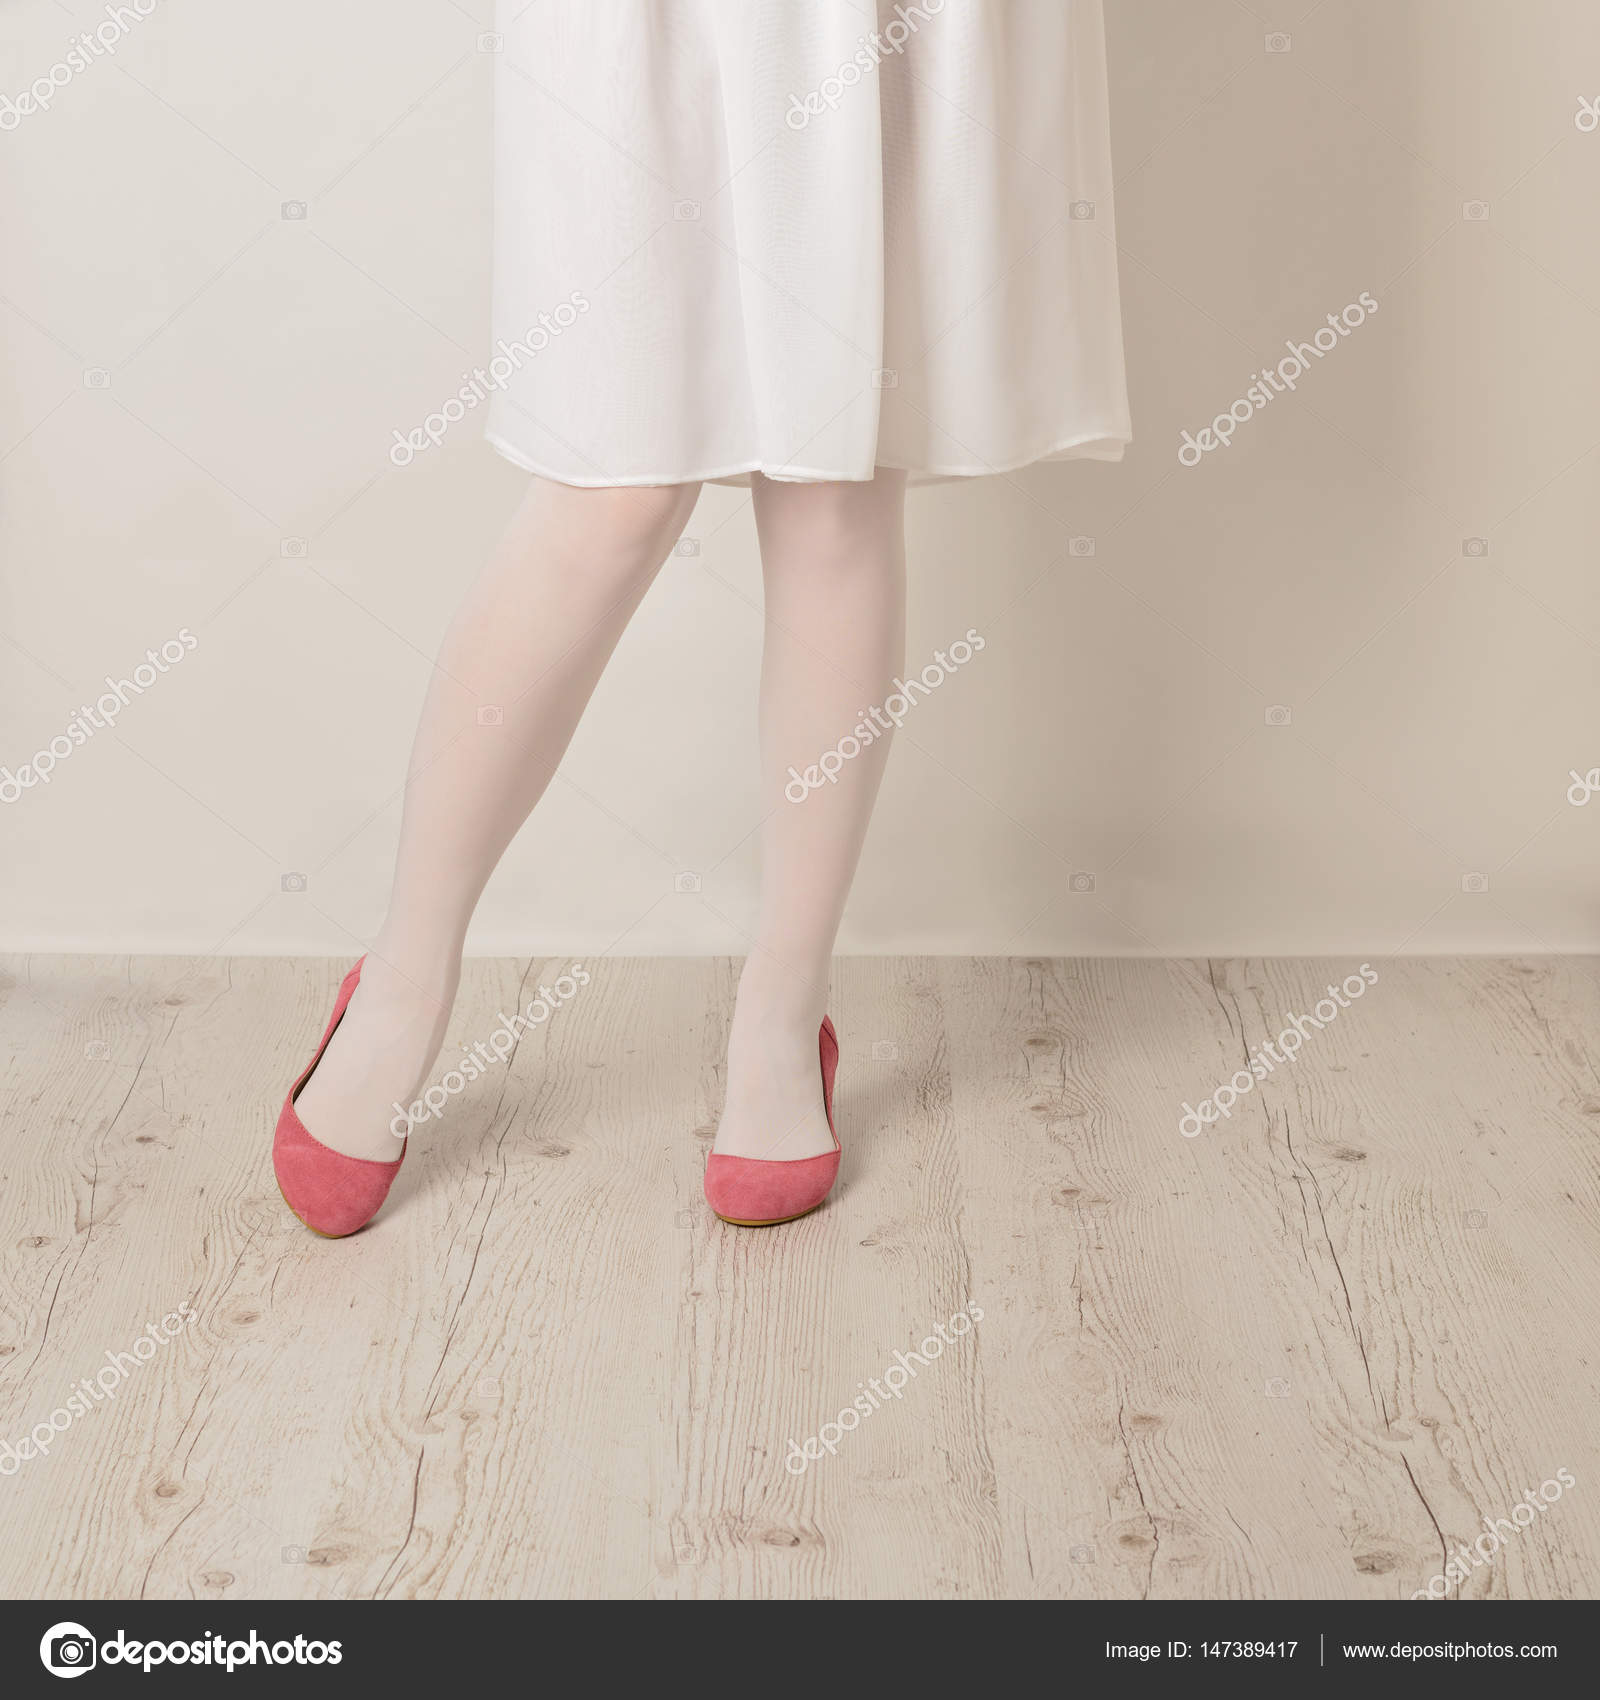 Женские ножки под юбкой